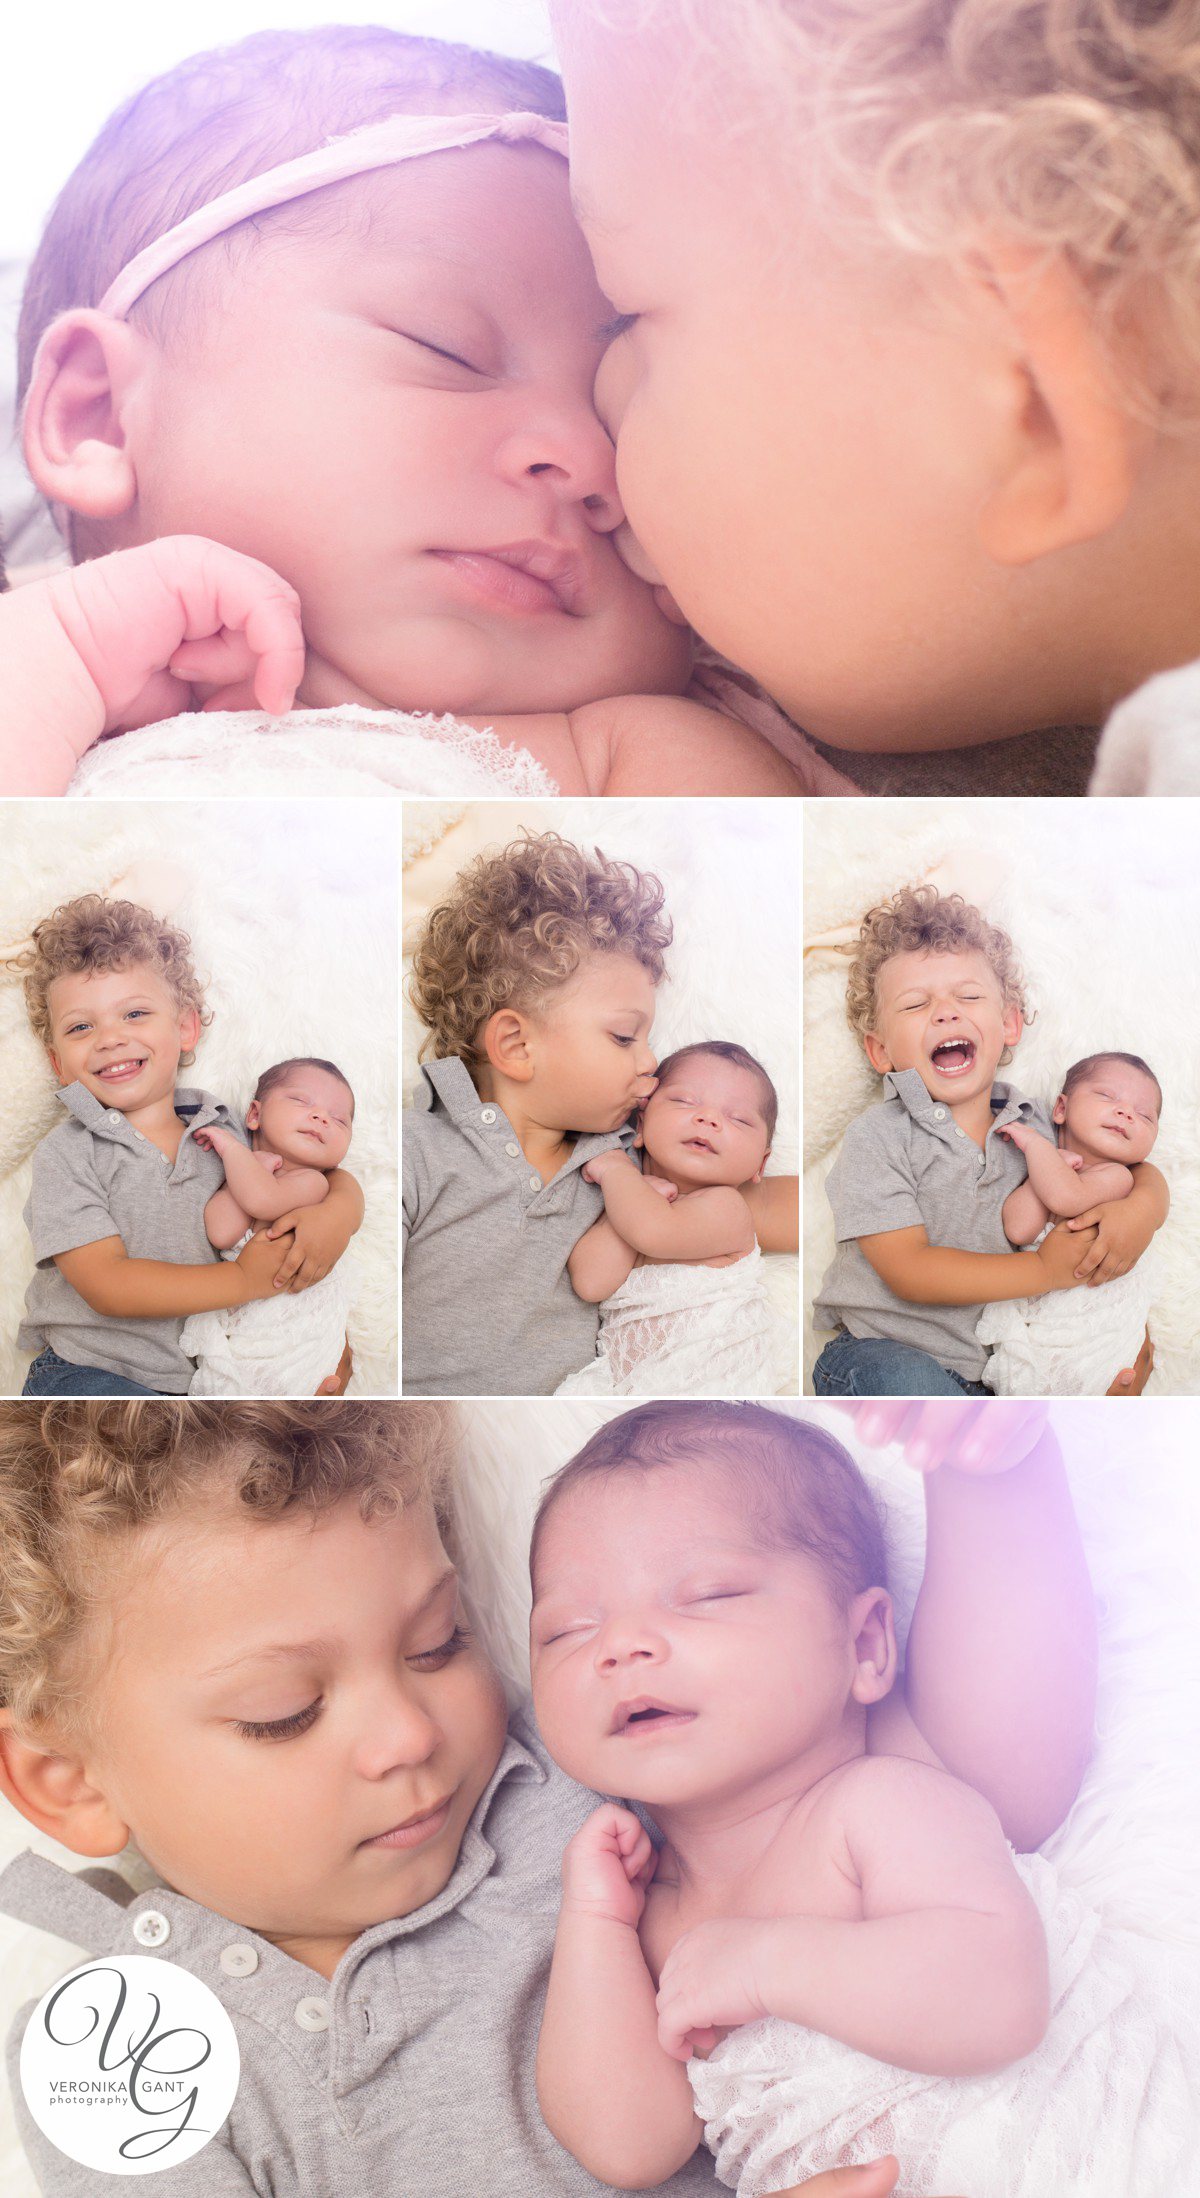 San-Antonio-Newborn-Photography-Ideas-by-Veronika-Gant-Christmas-Theme-08